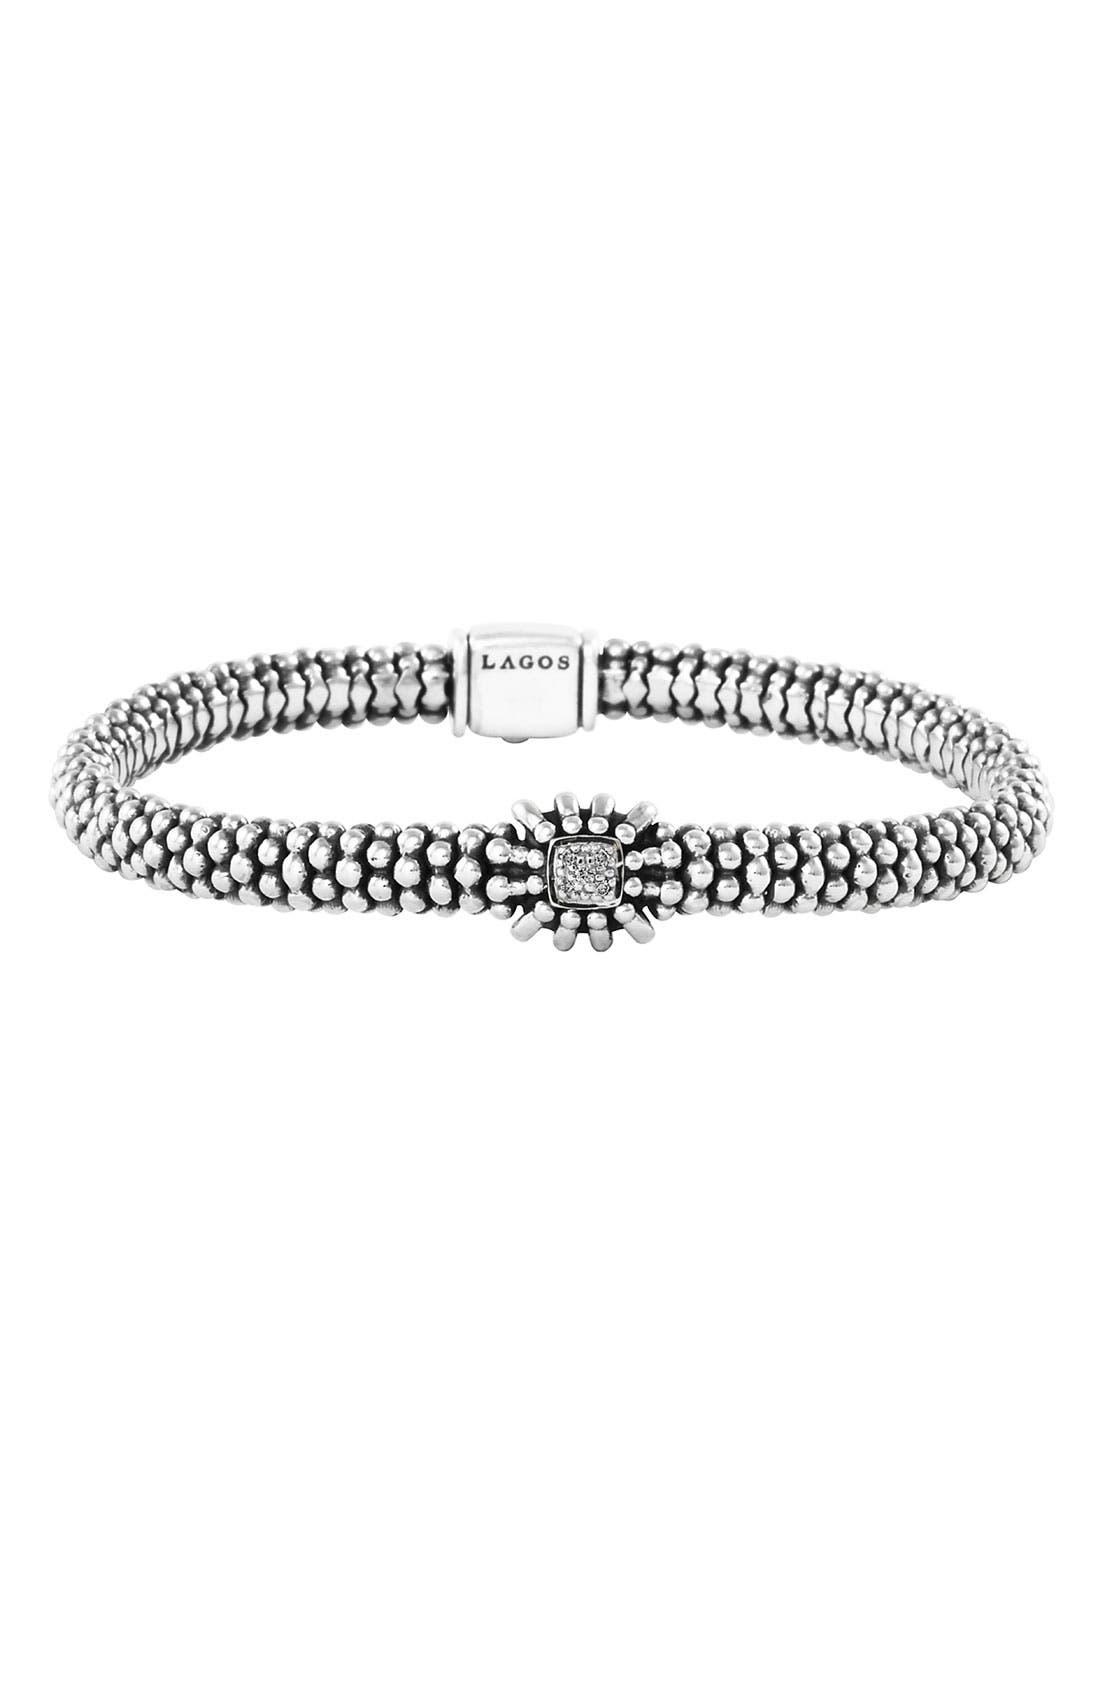 Alternate Image 1 Selected - LAGOS 'Prêt-à-Porter - Daisy' Diamond Caviar Rope Bracelet